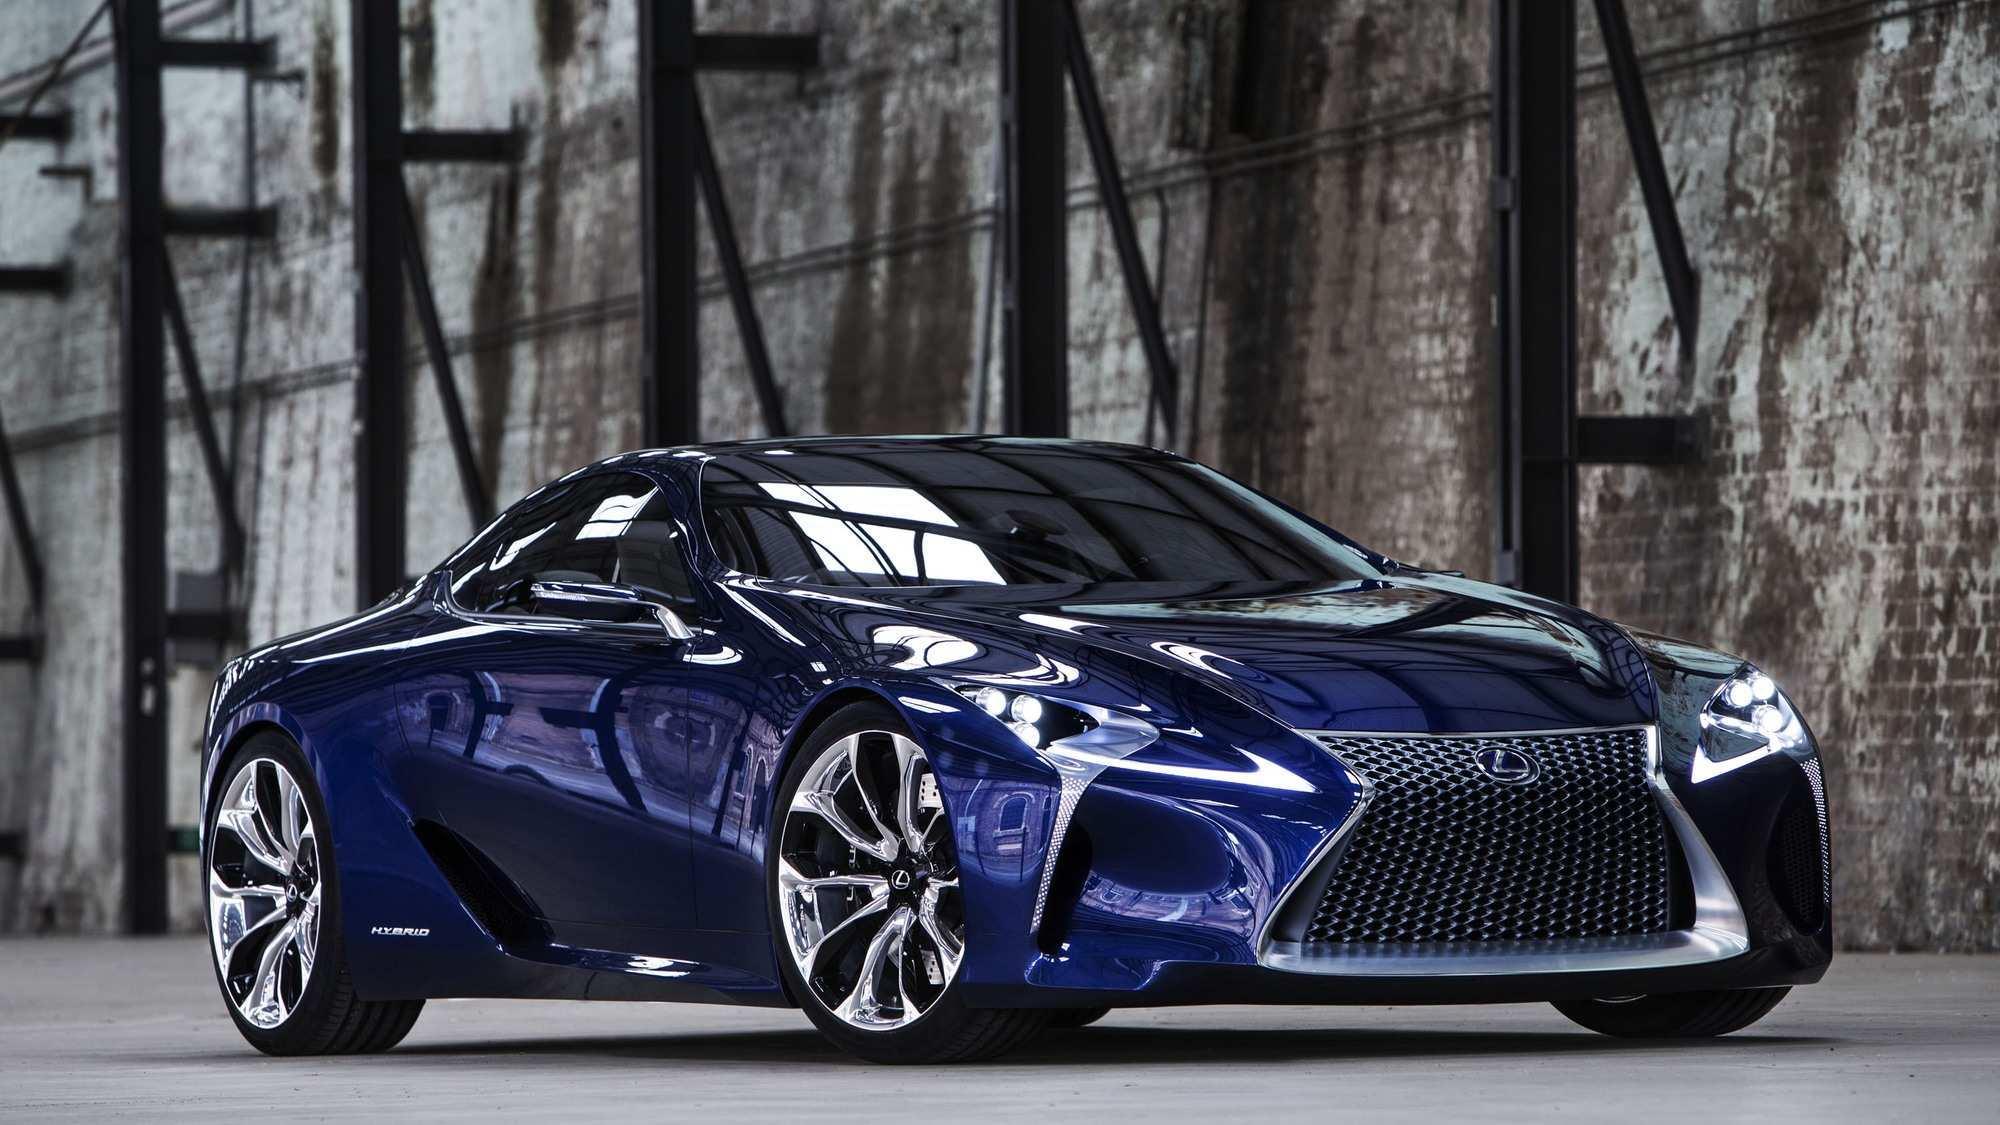 13 Best Review Lexus Lf Lc Release Date Release with Lexus Lf Lc Release Date